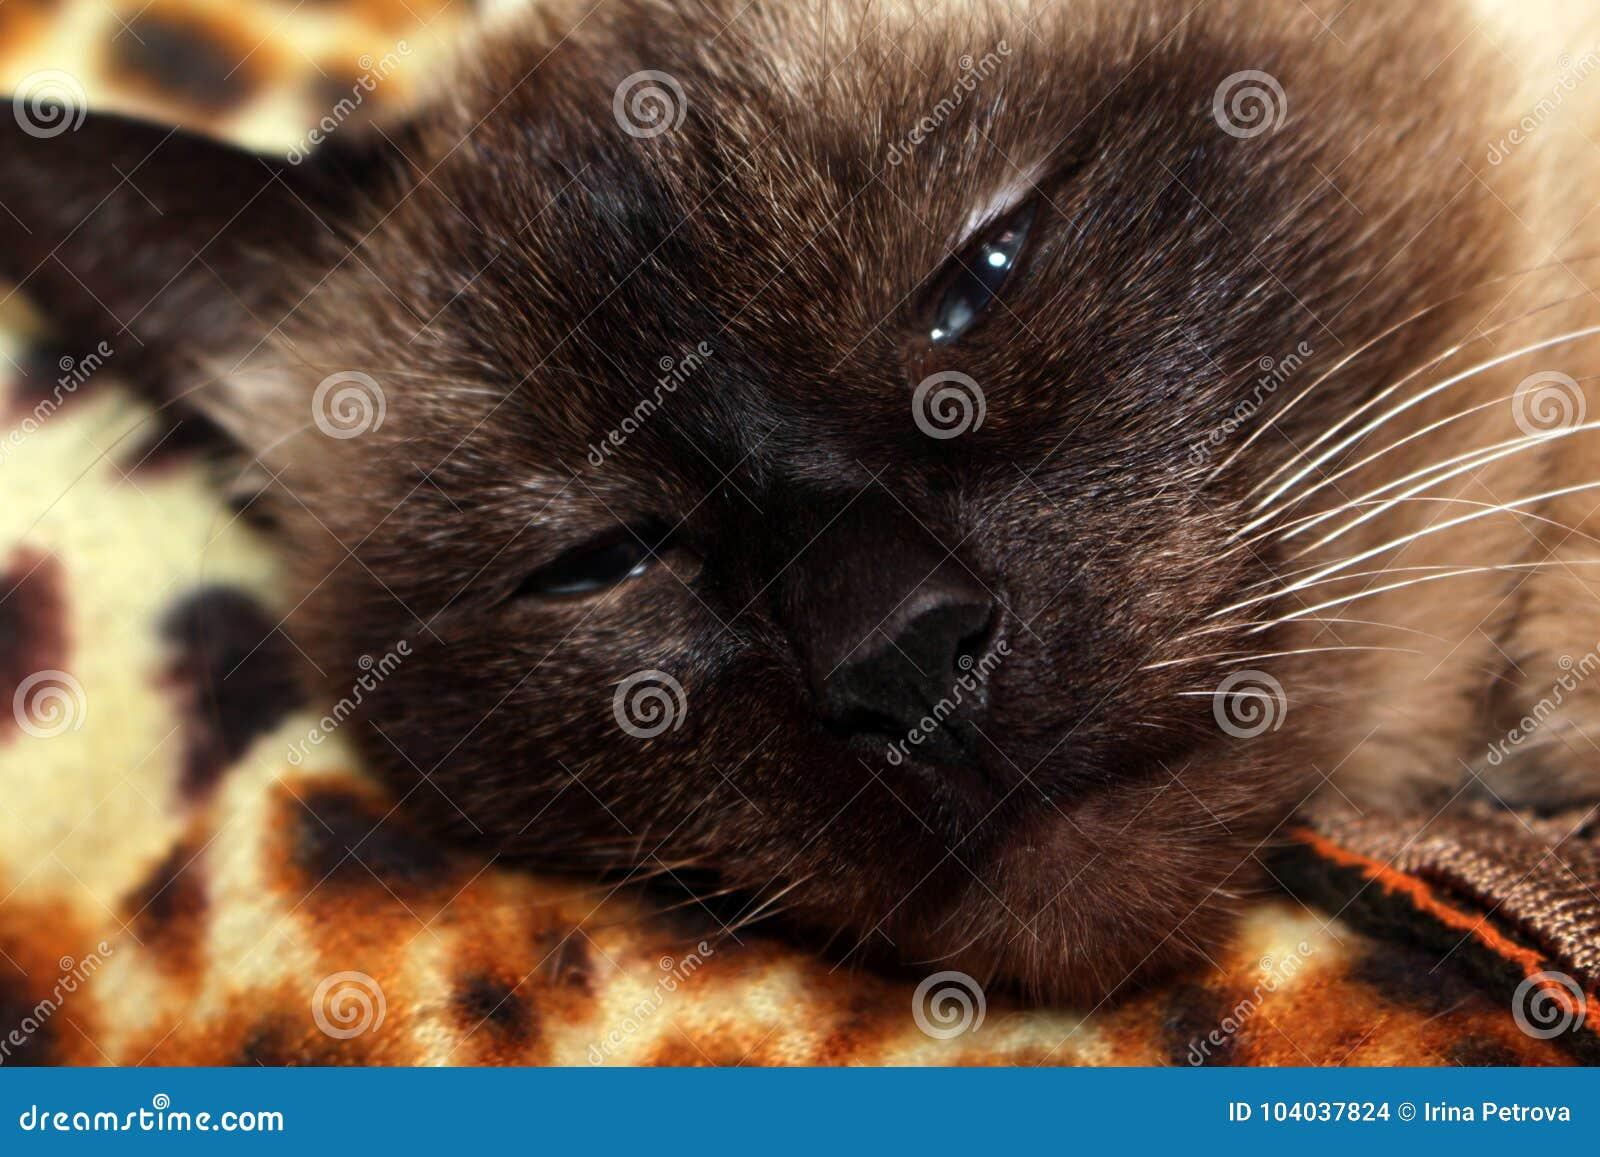 Siamese cat asleep